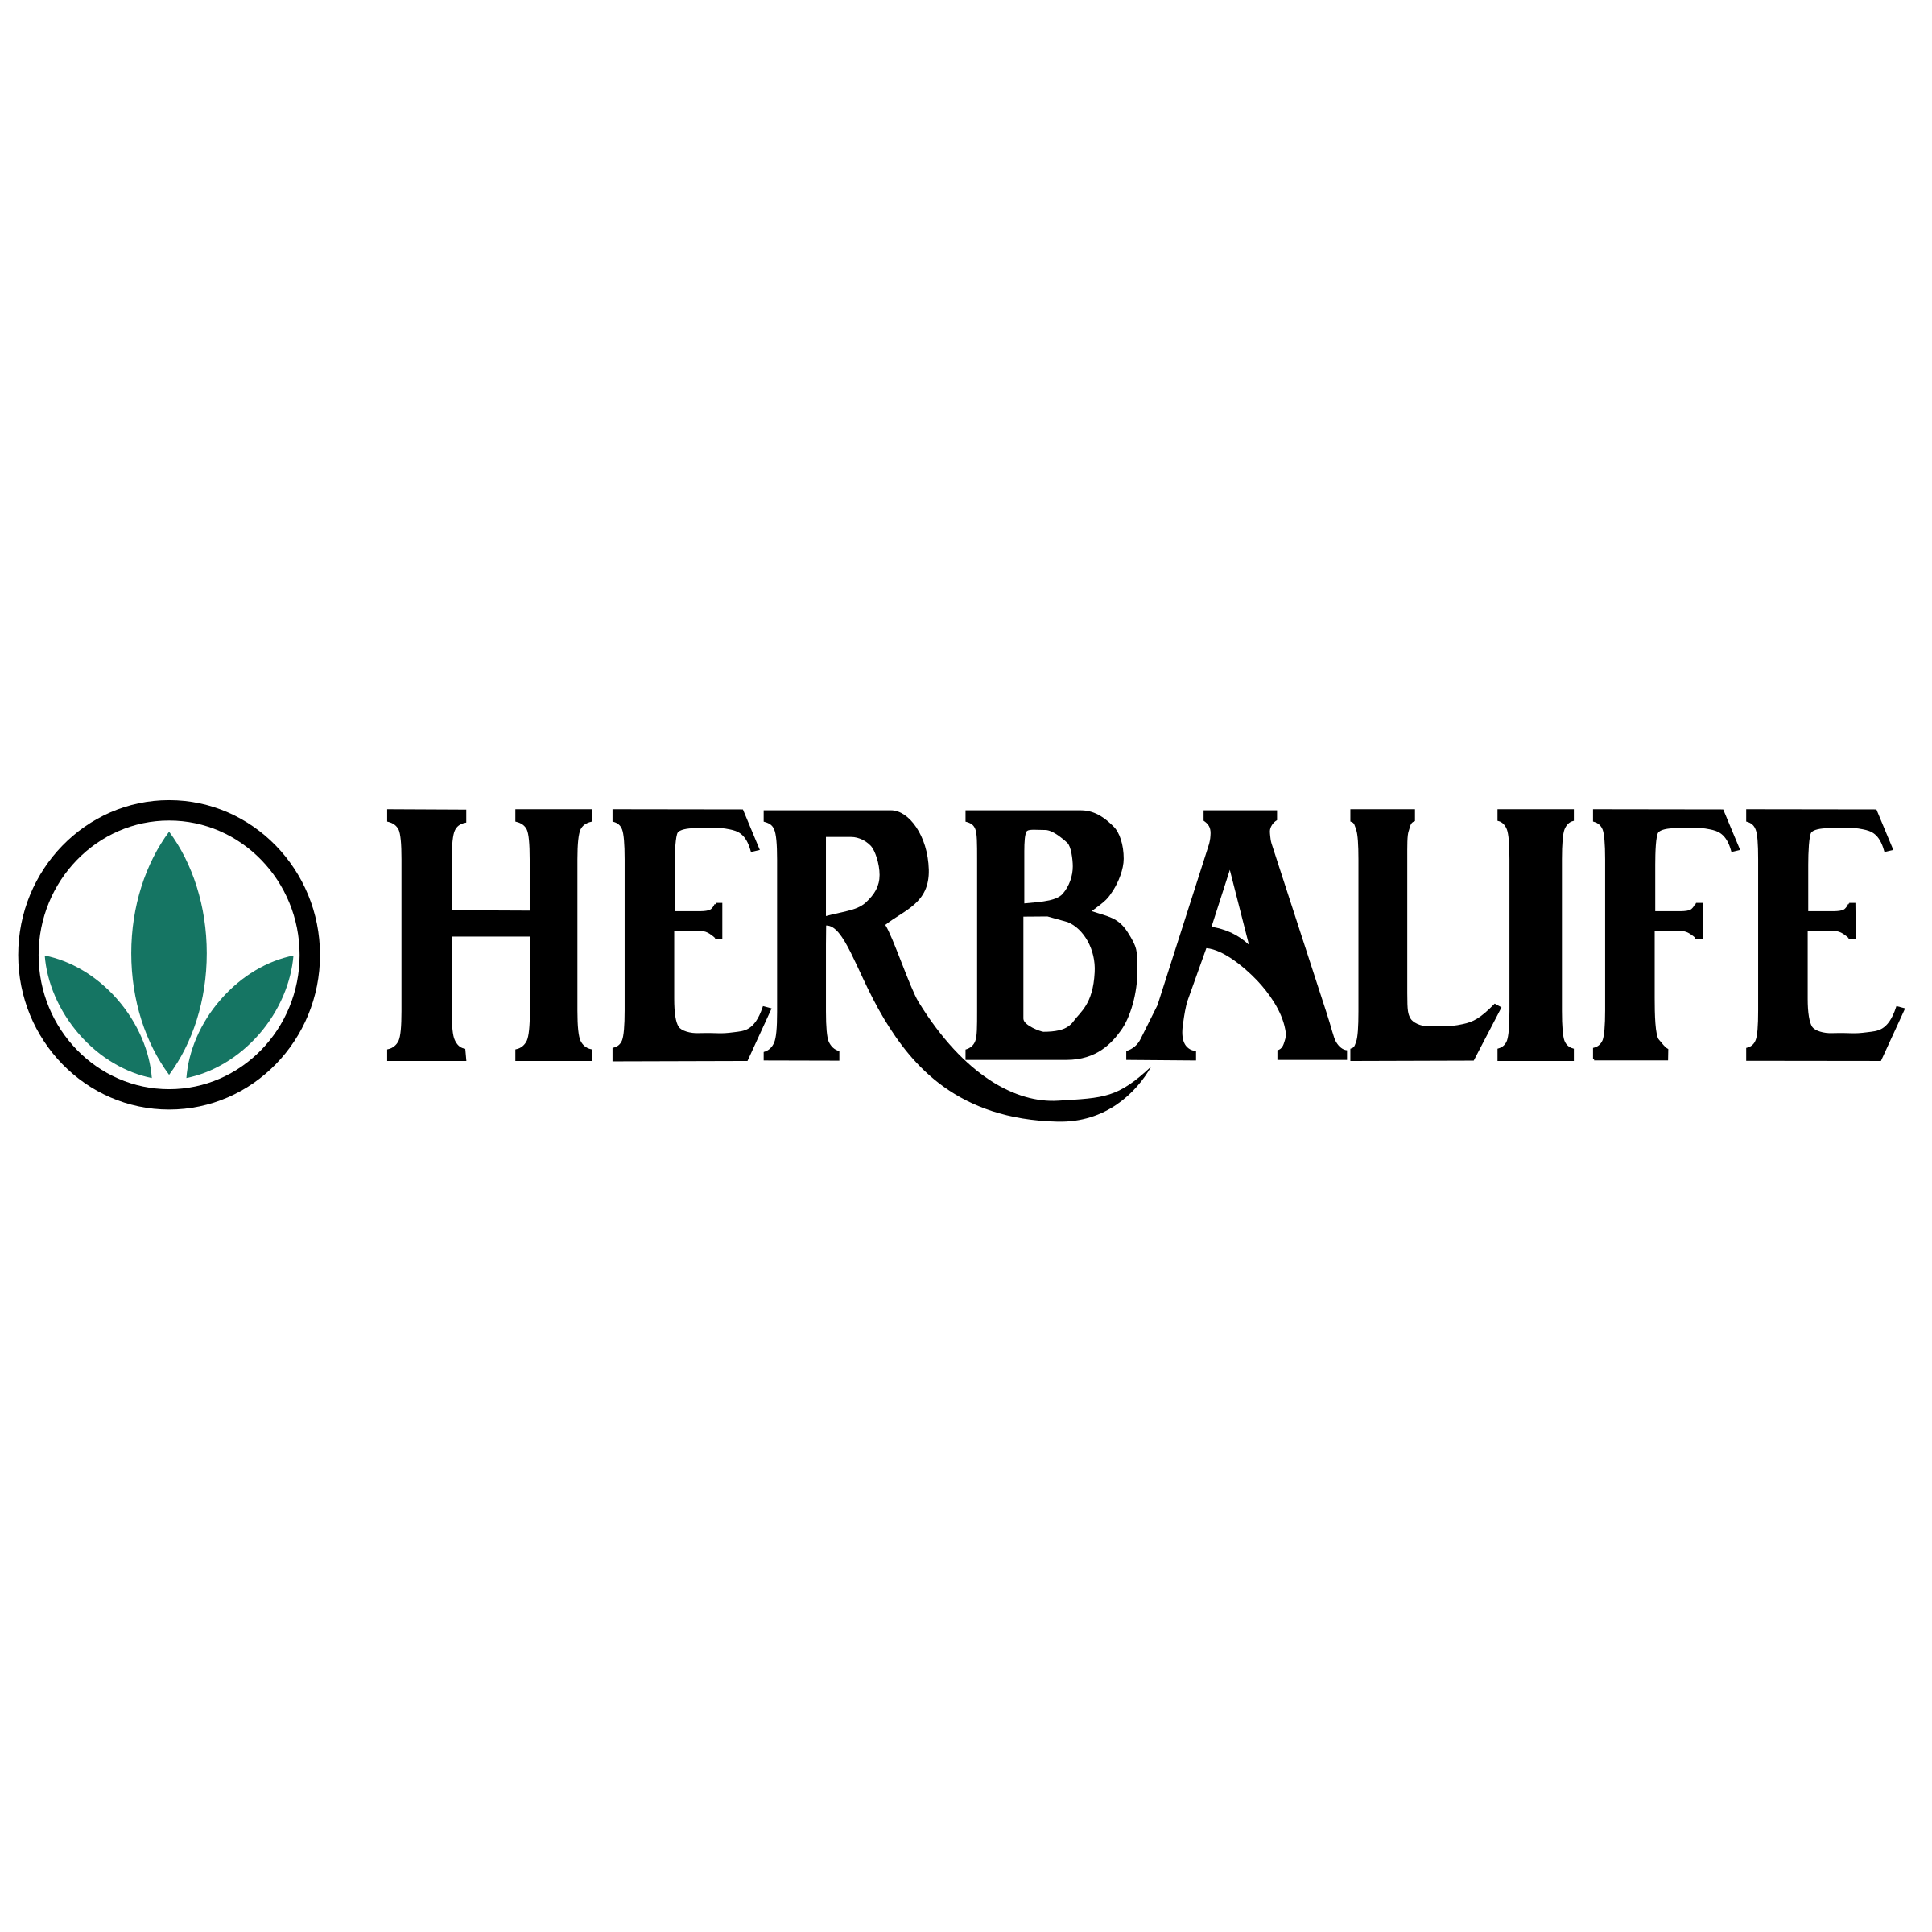 Herbalife Logo PNG Transparent & SVG Vector - Freebie Supply - Herbalife Logo Transparent